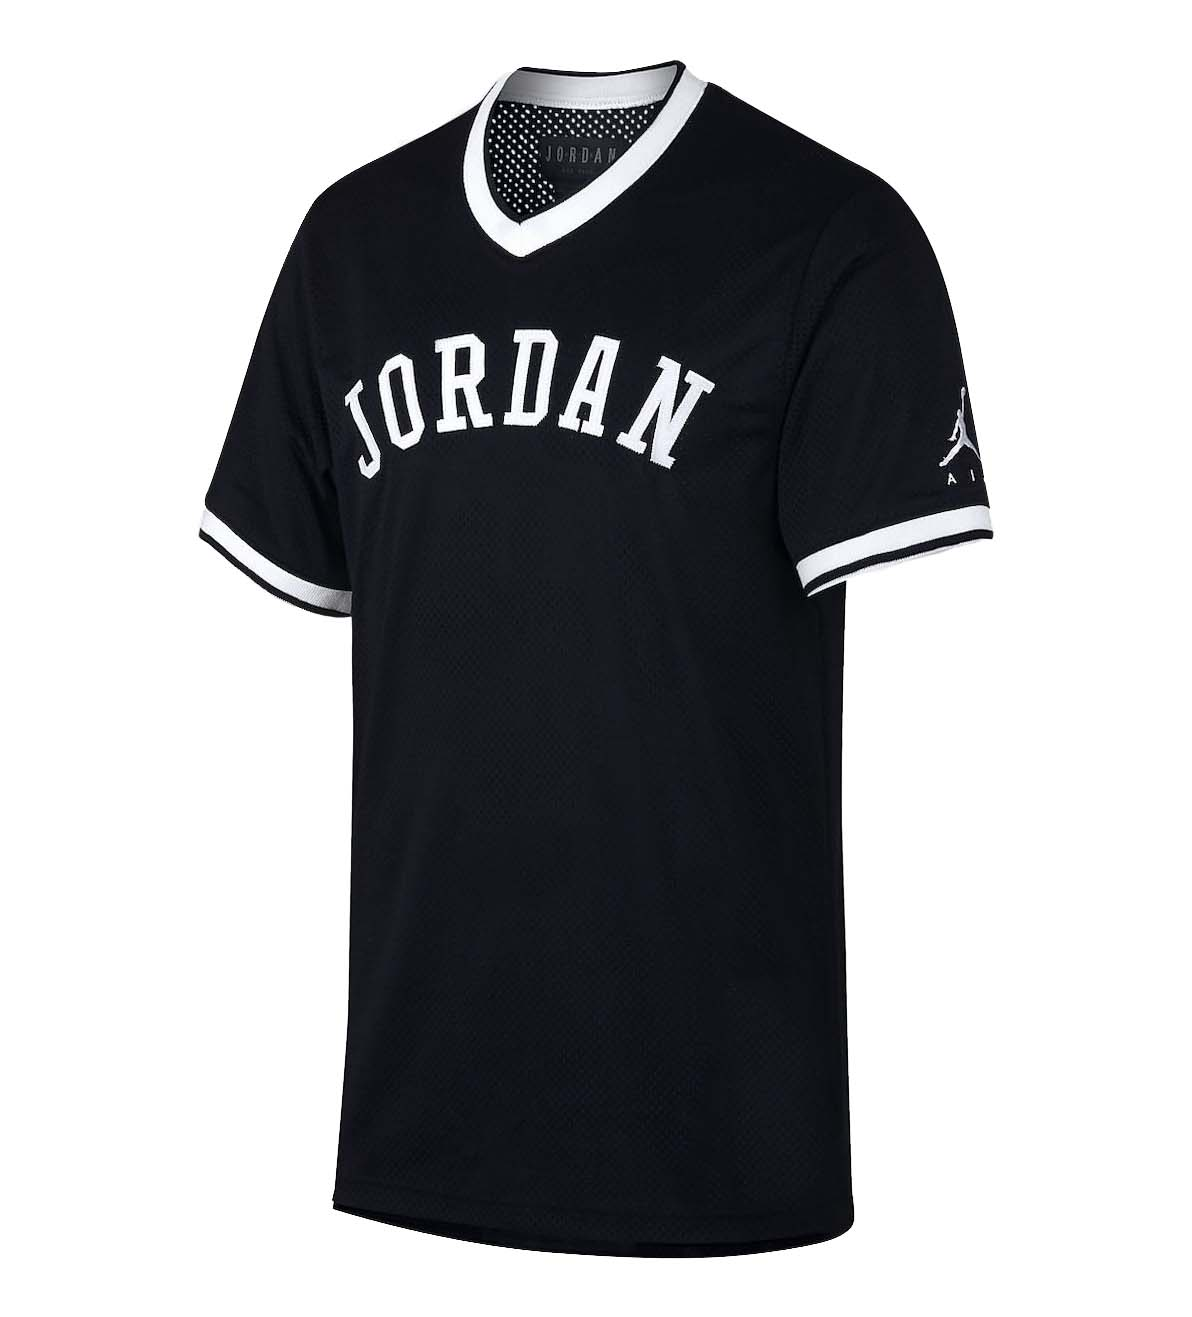 traducir Celo insertar  Jordan Men's Nike Jumpman Air Mesh Jersey Top (Medium, Black/White) -  Walmart.com - Walmart.com